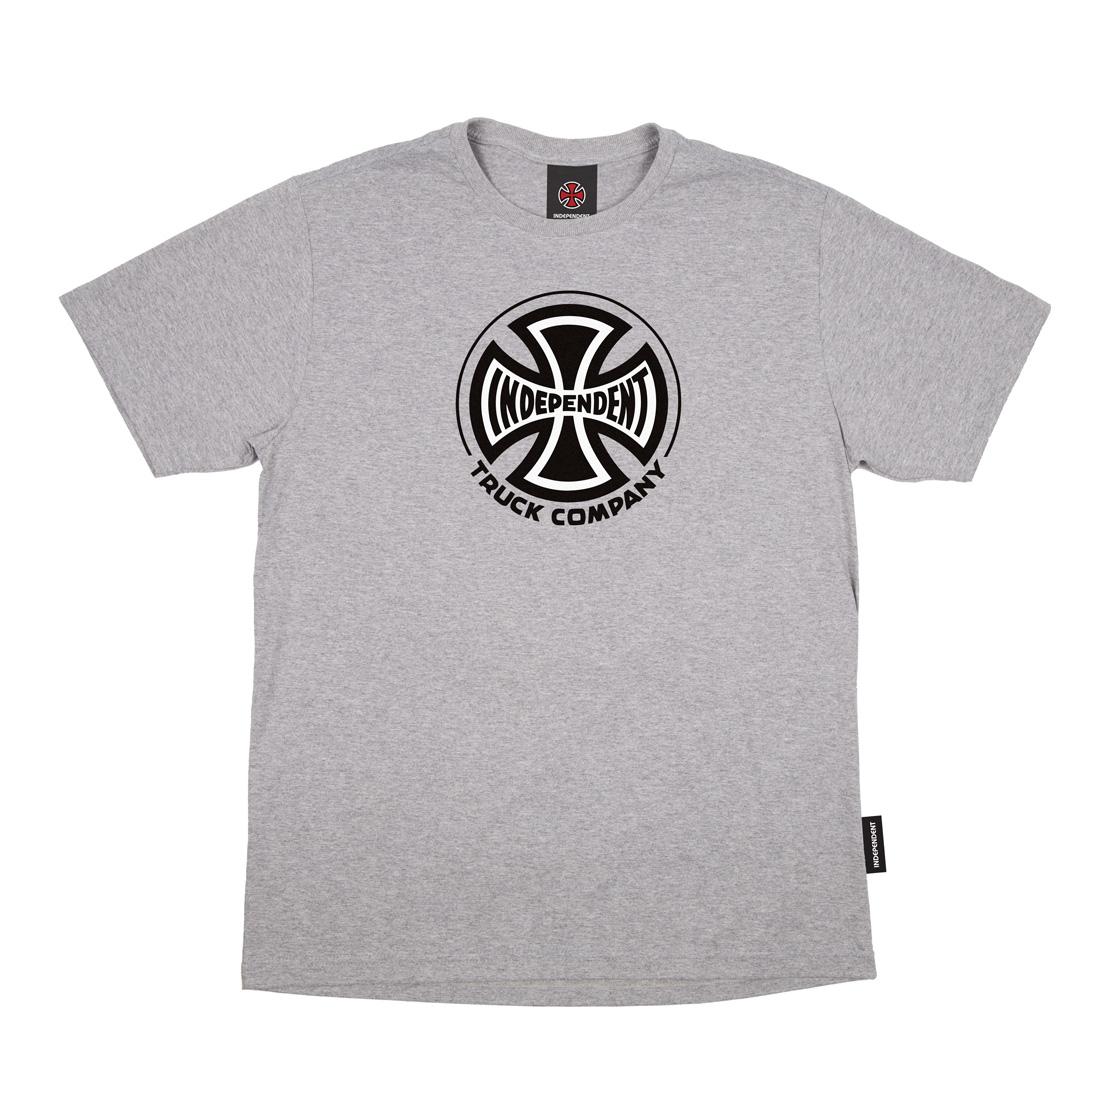 Camiseta Independent Truck Co Cinza